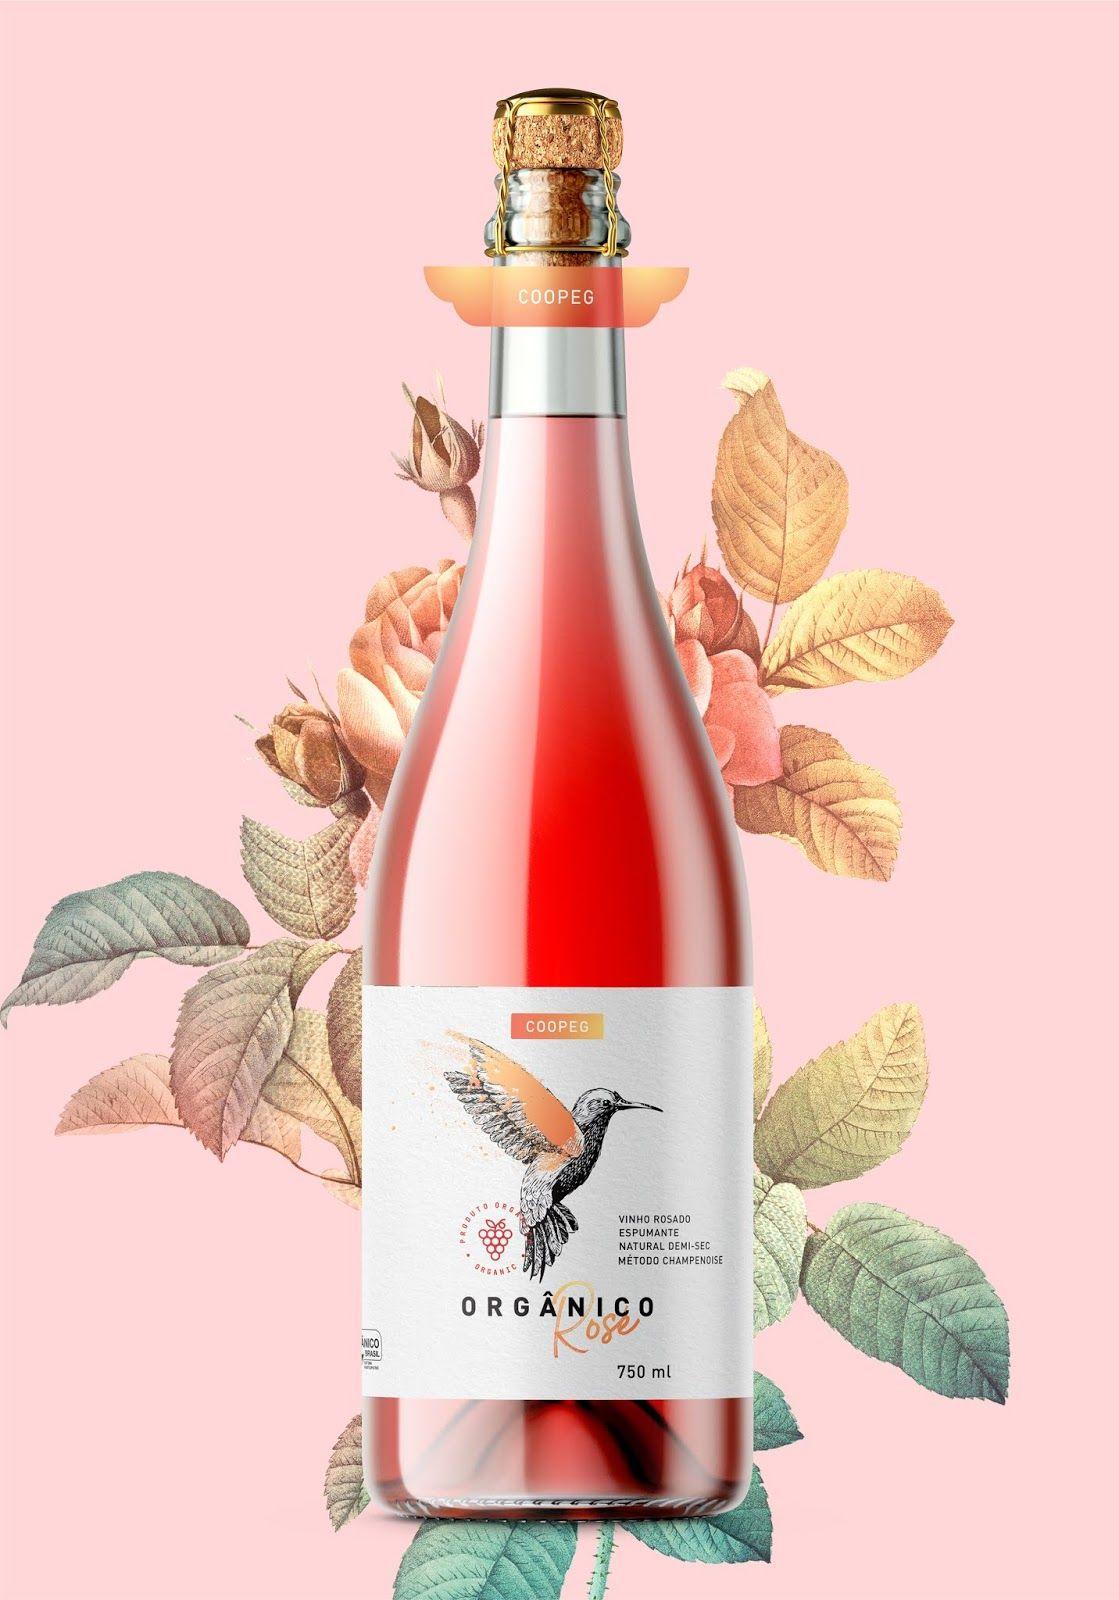 Coopeg Rose Organic Sparkling Wine In 2020 Wine Bottle Label Design Wine Bottle Packaging Wine Bottle Design